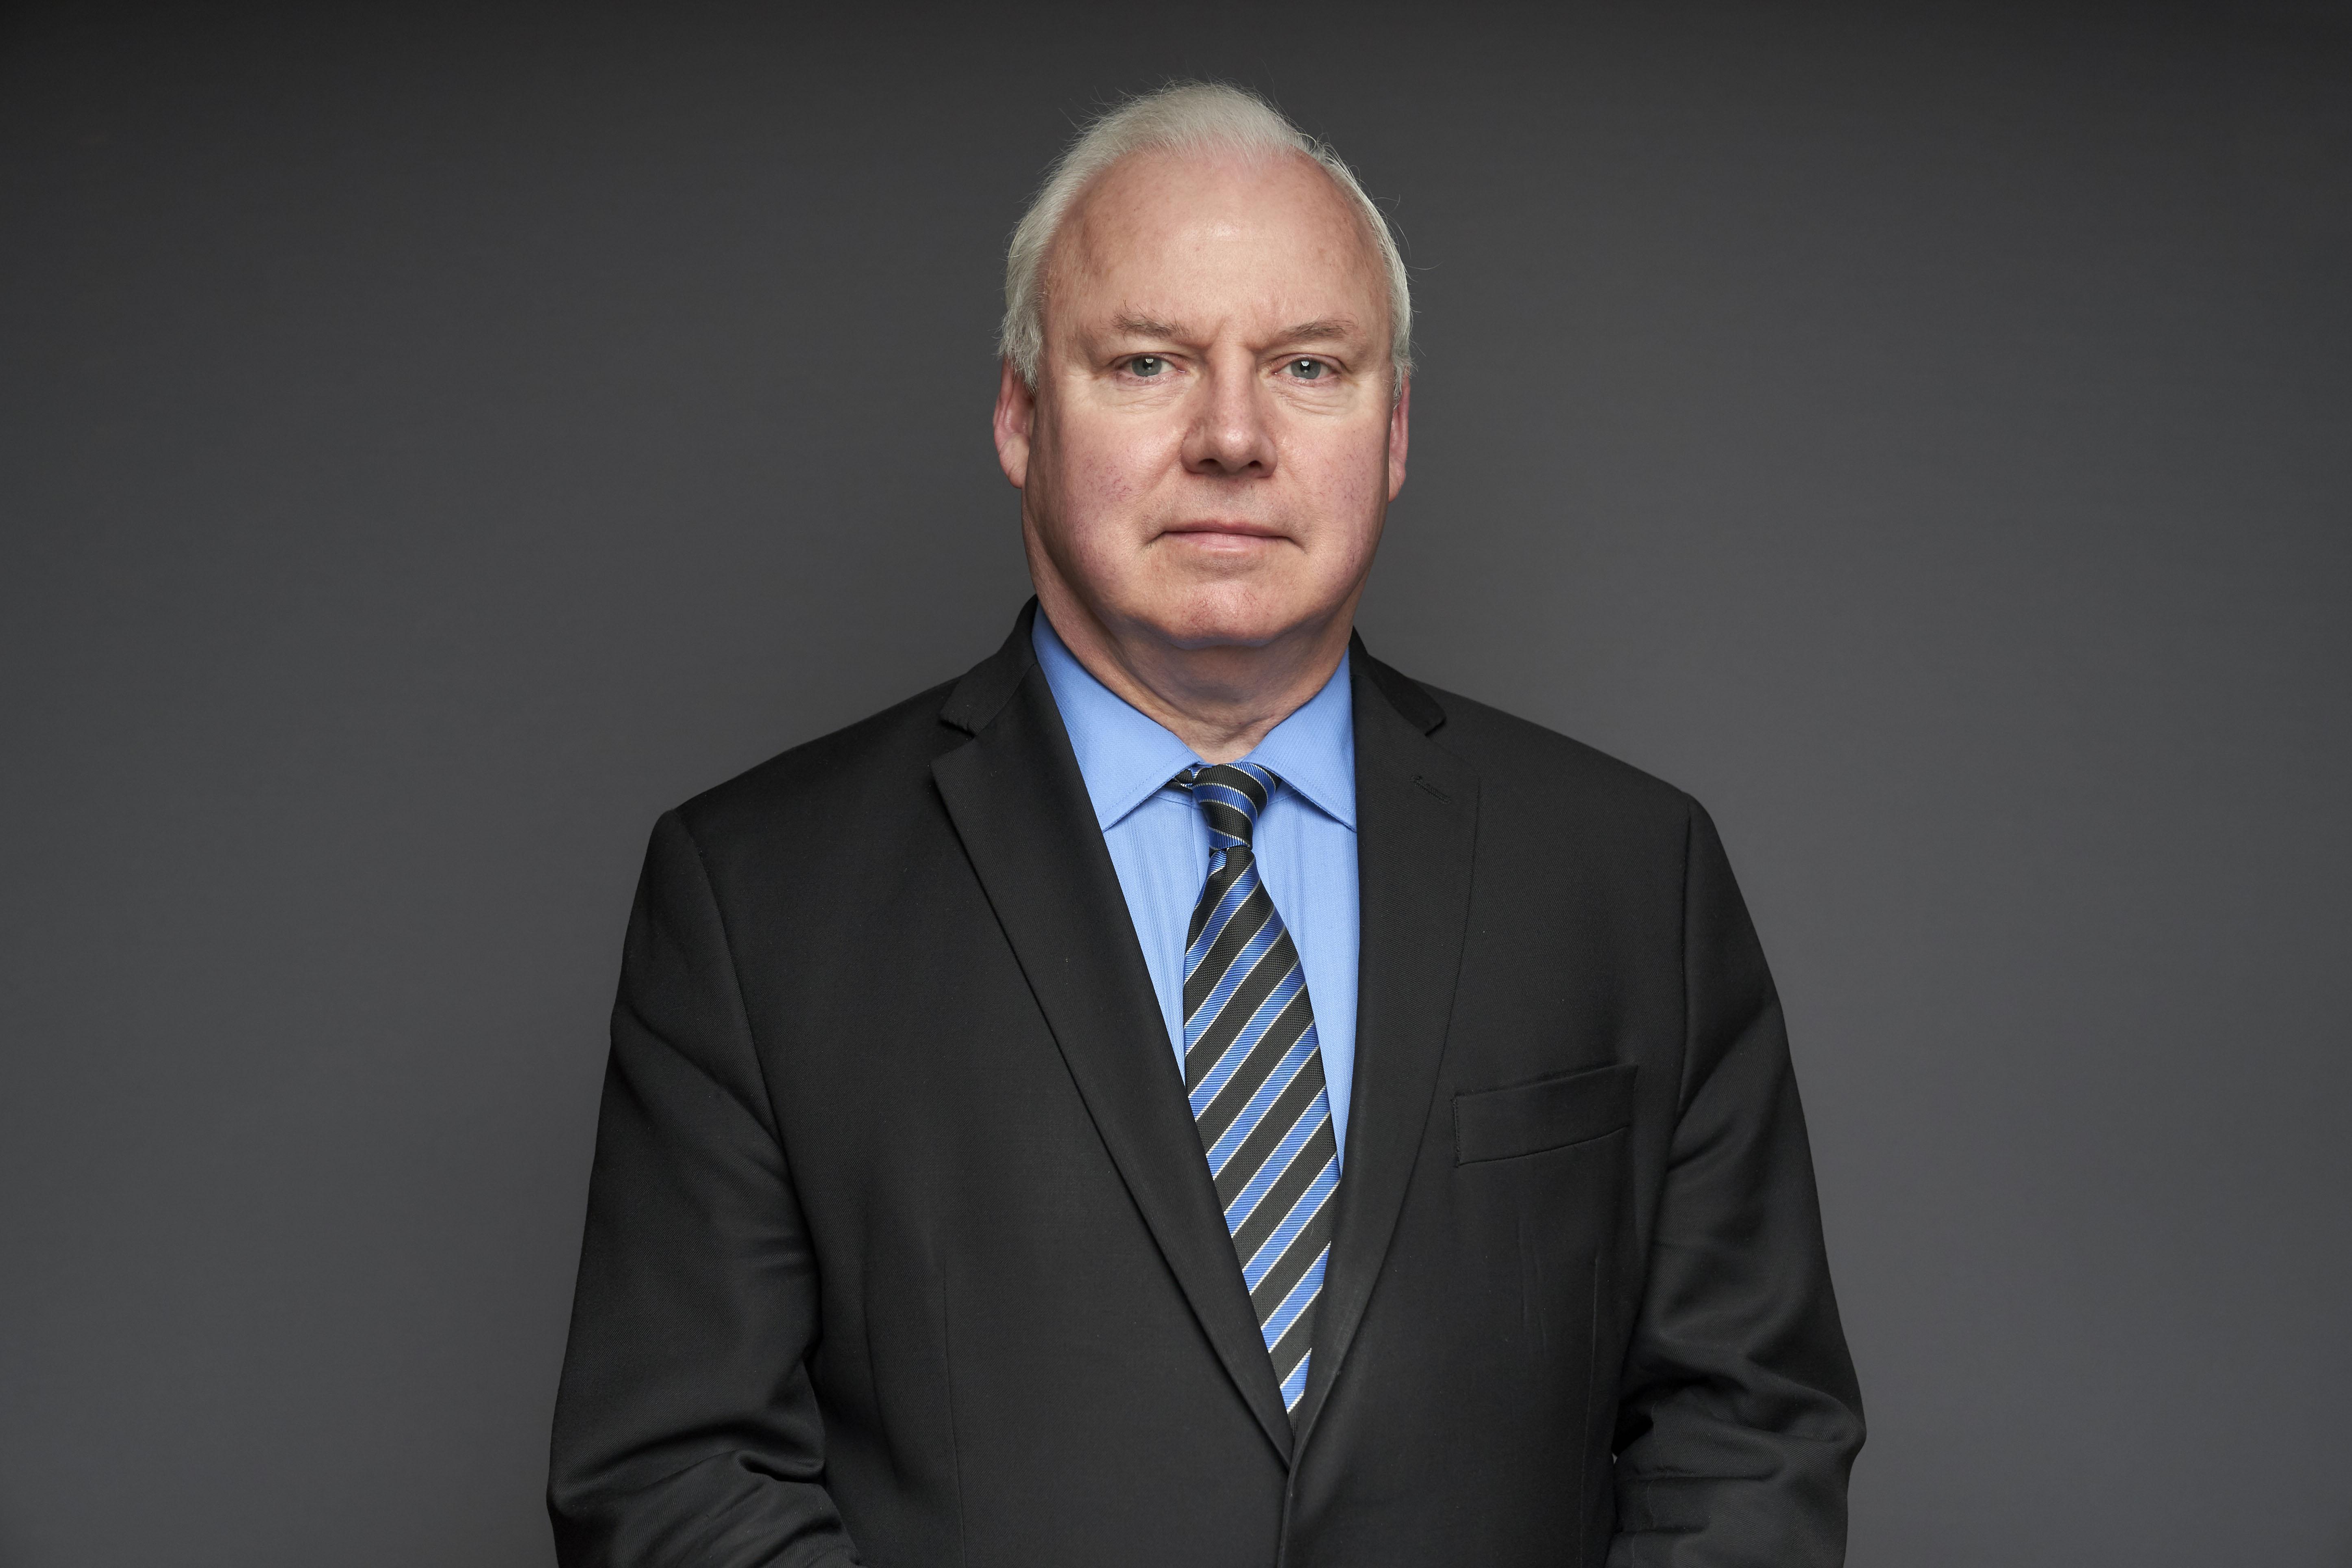 Prof. James Arthur